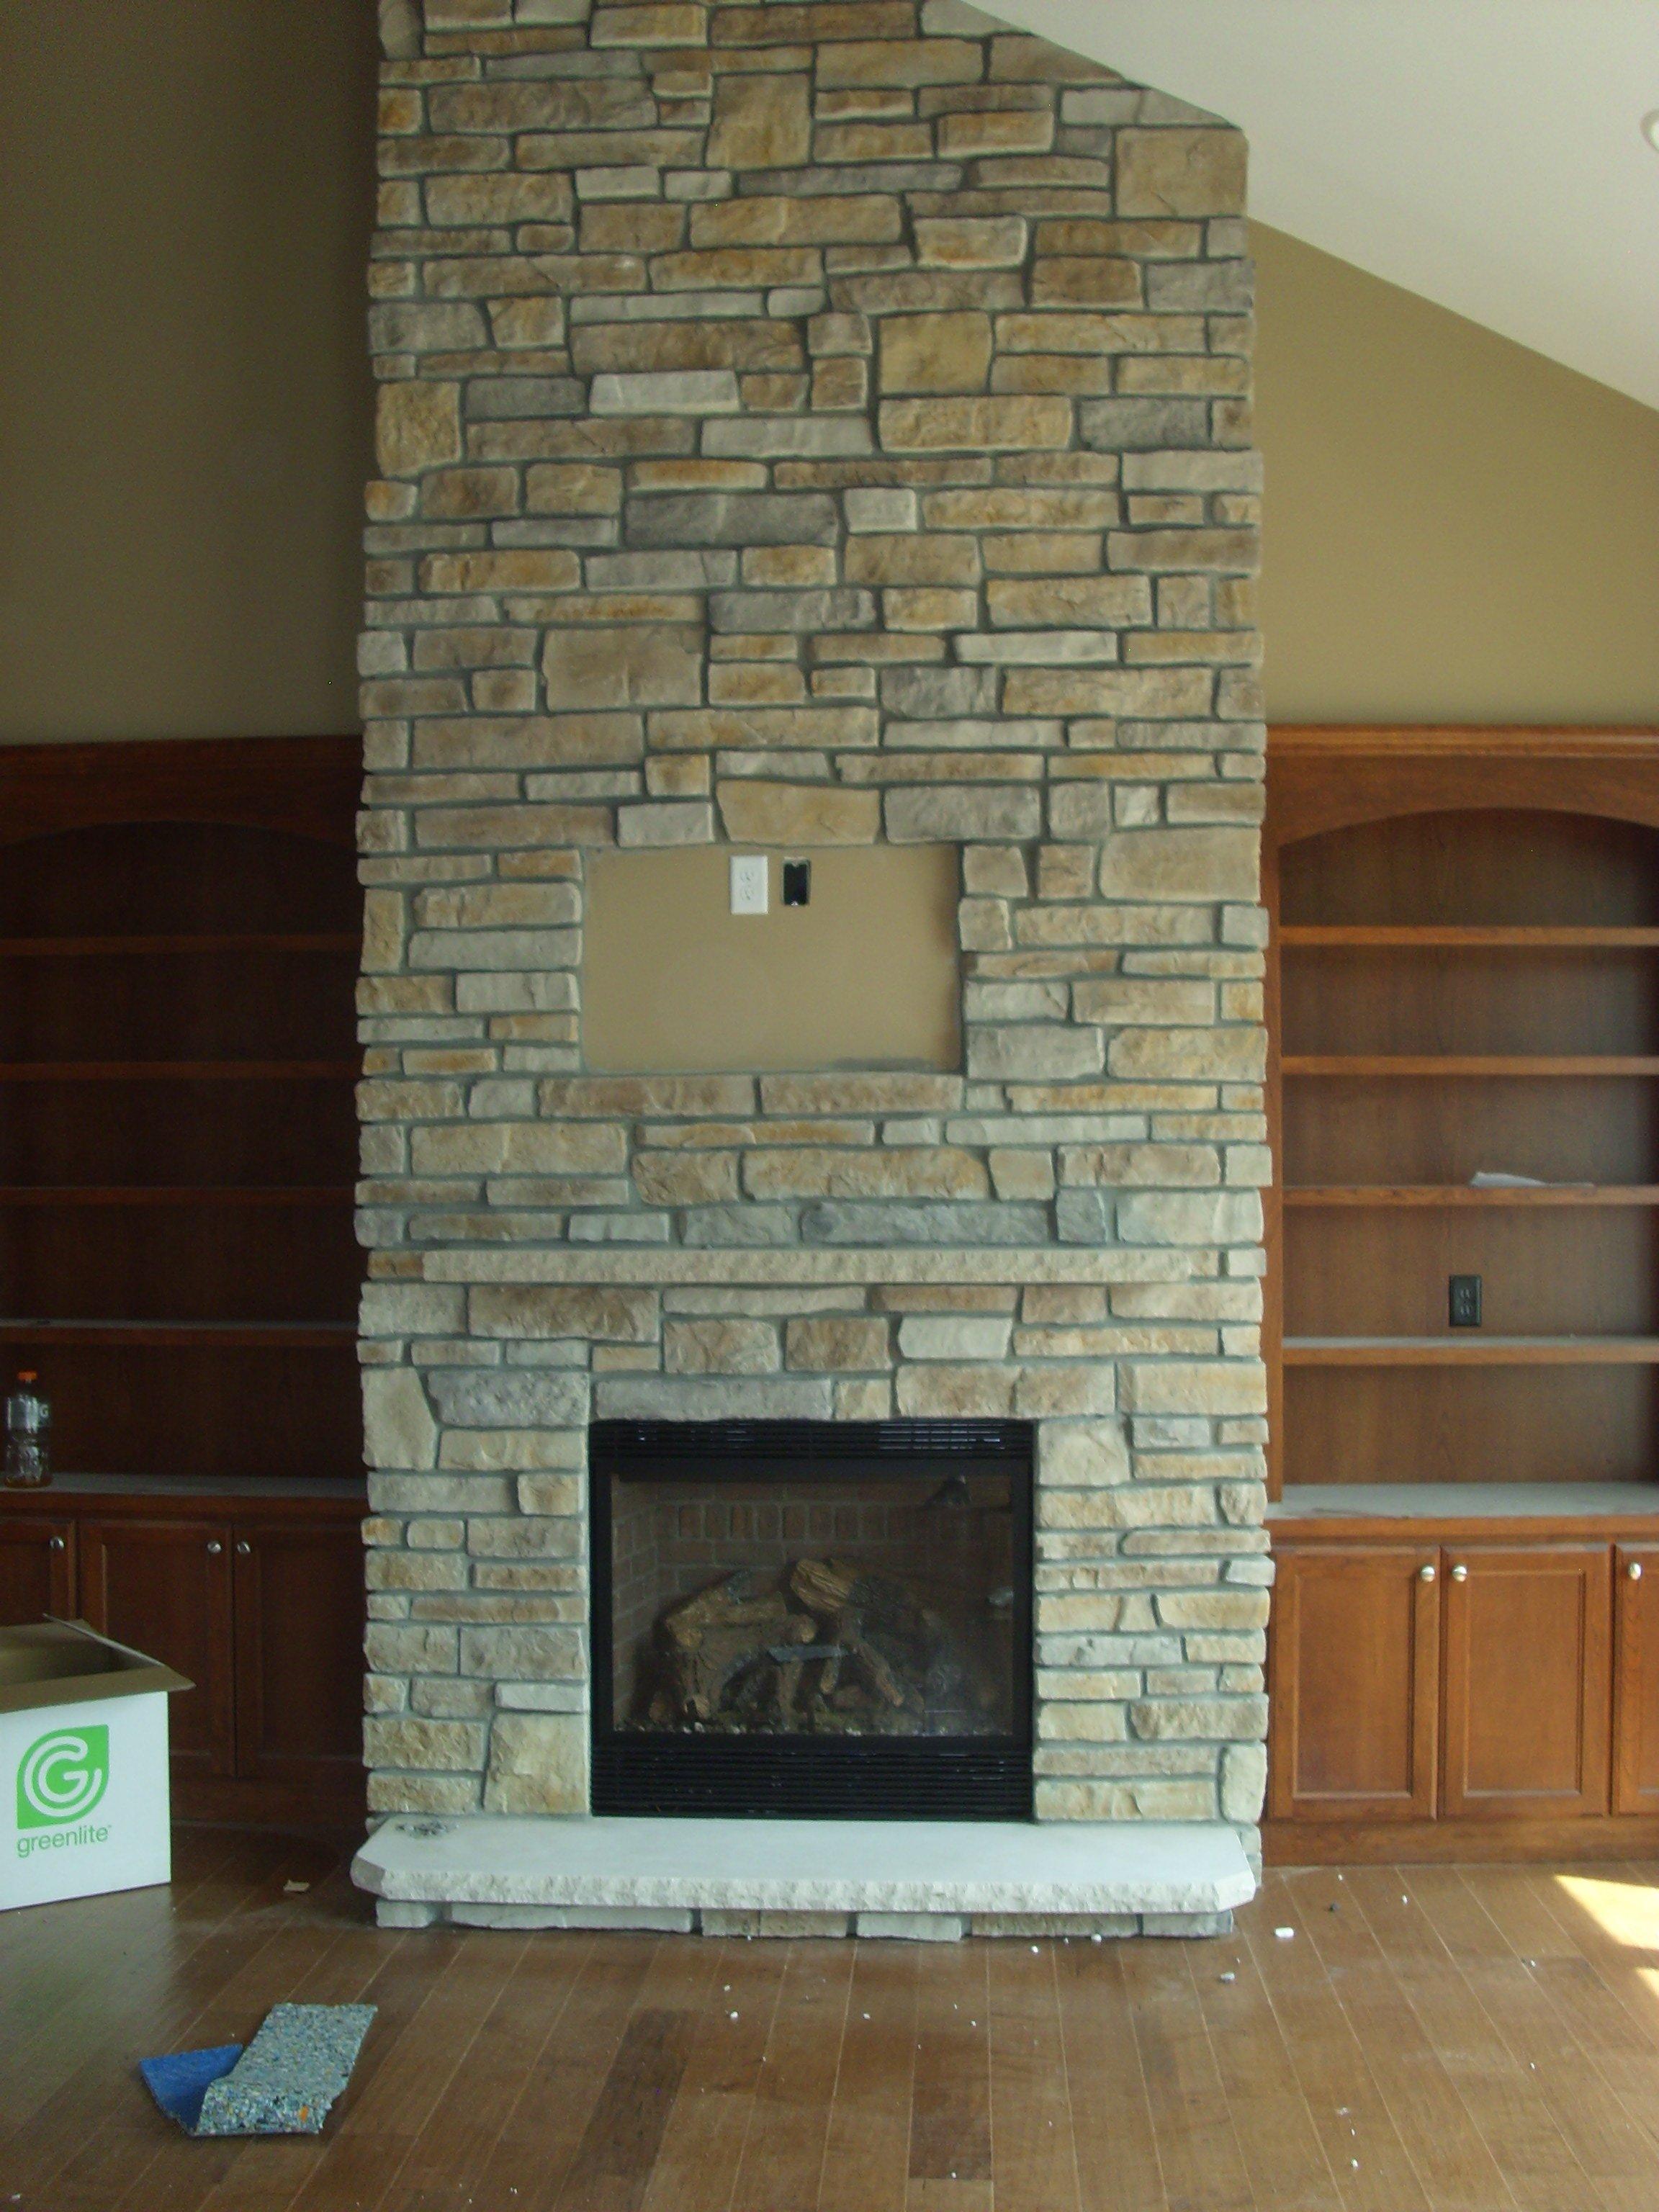 Mendota, mendota heater, gas fireplace, traditional fireplace, DXV 45, DXV45